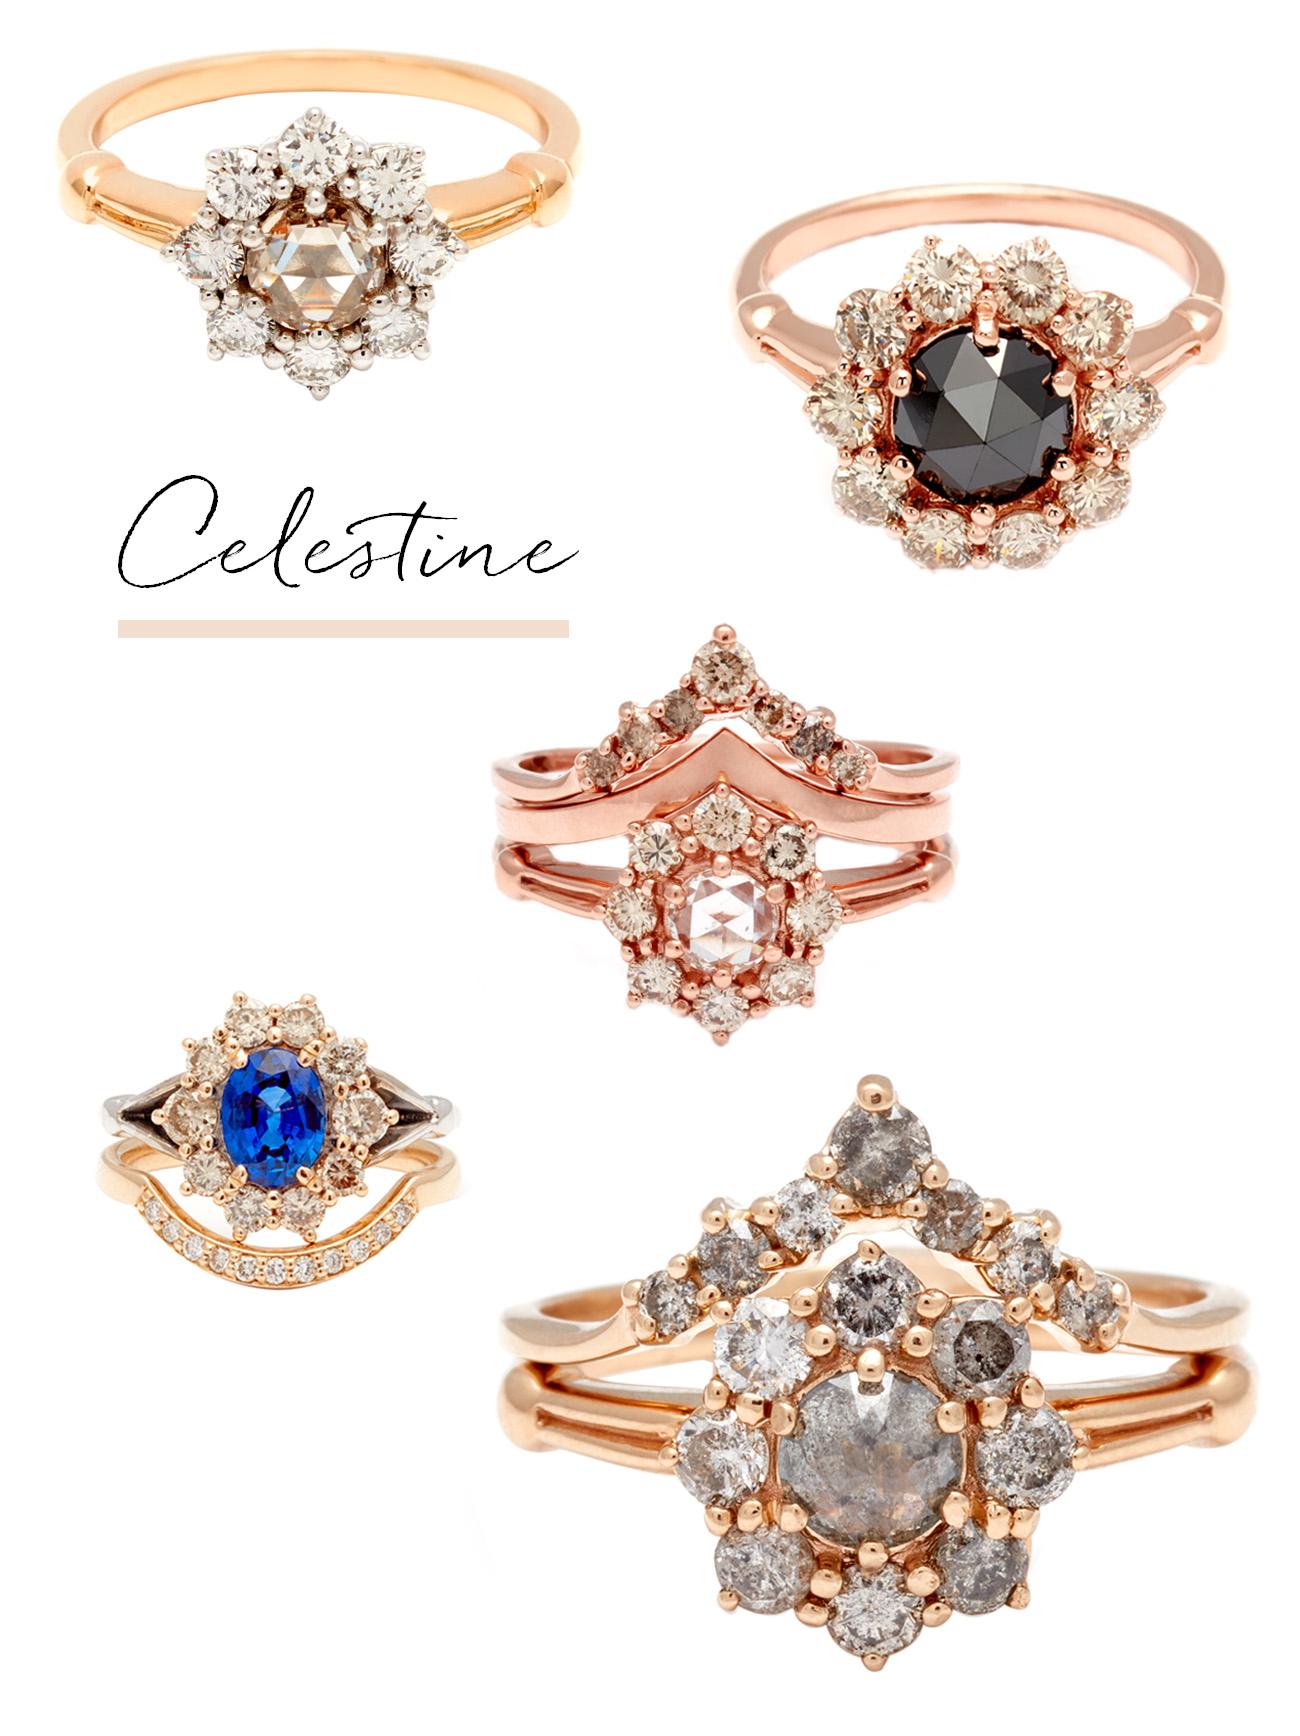 anna sheffield Celestine engagement rings